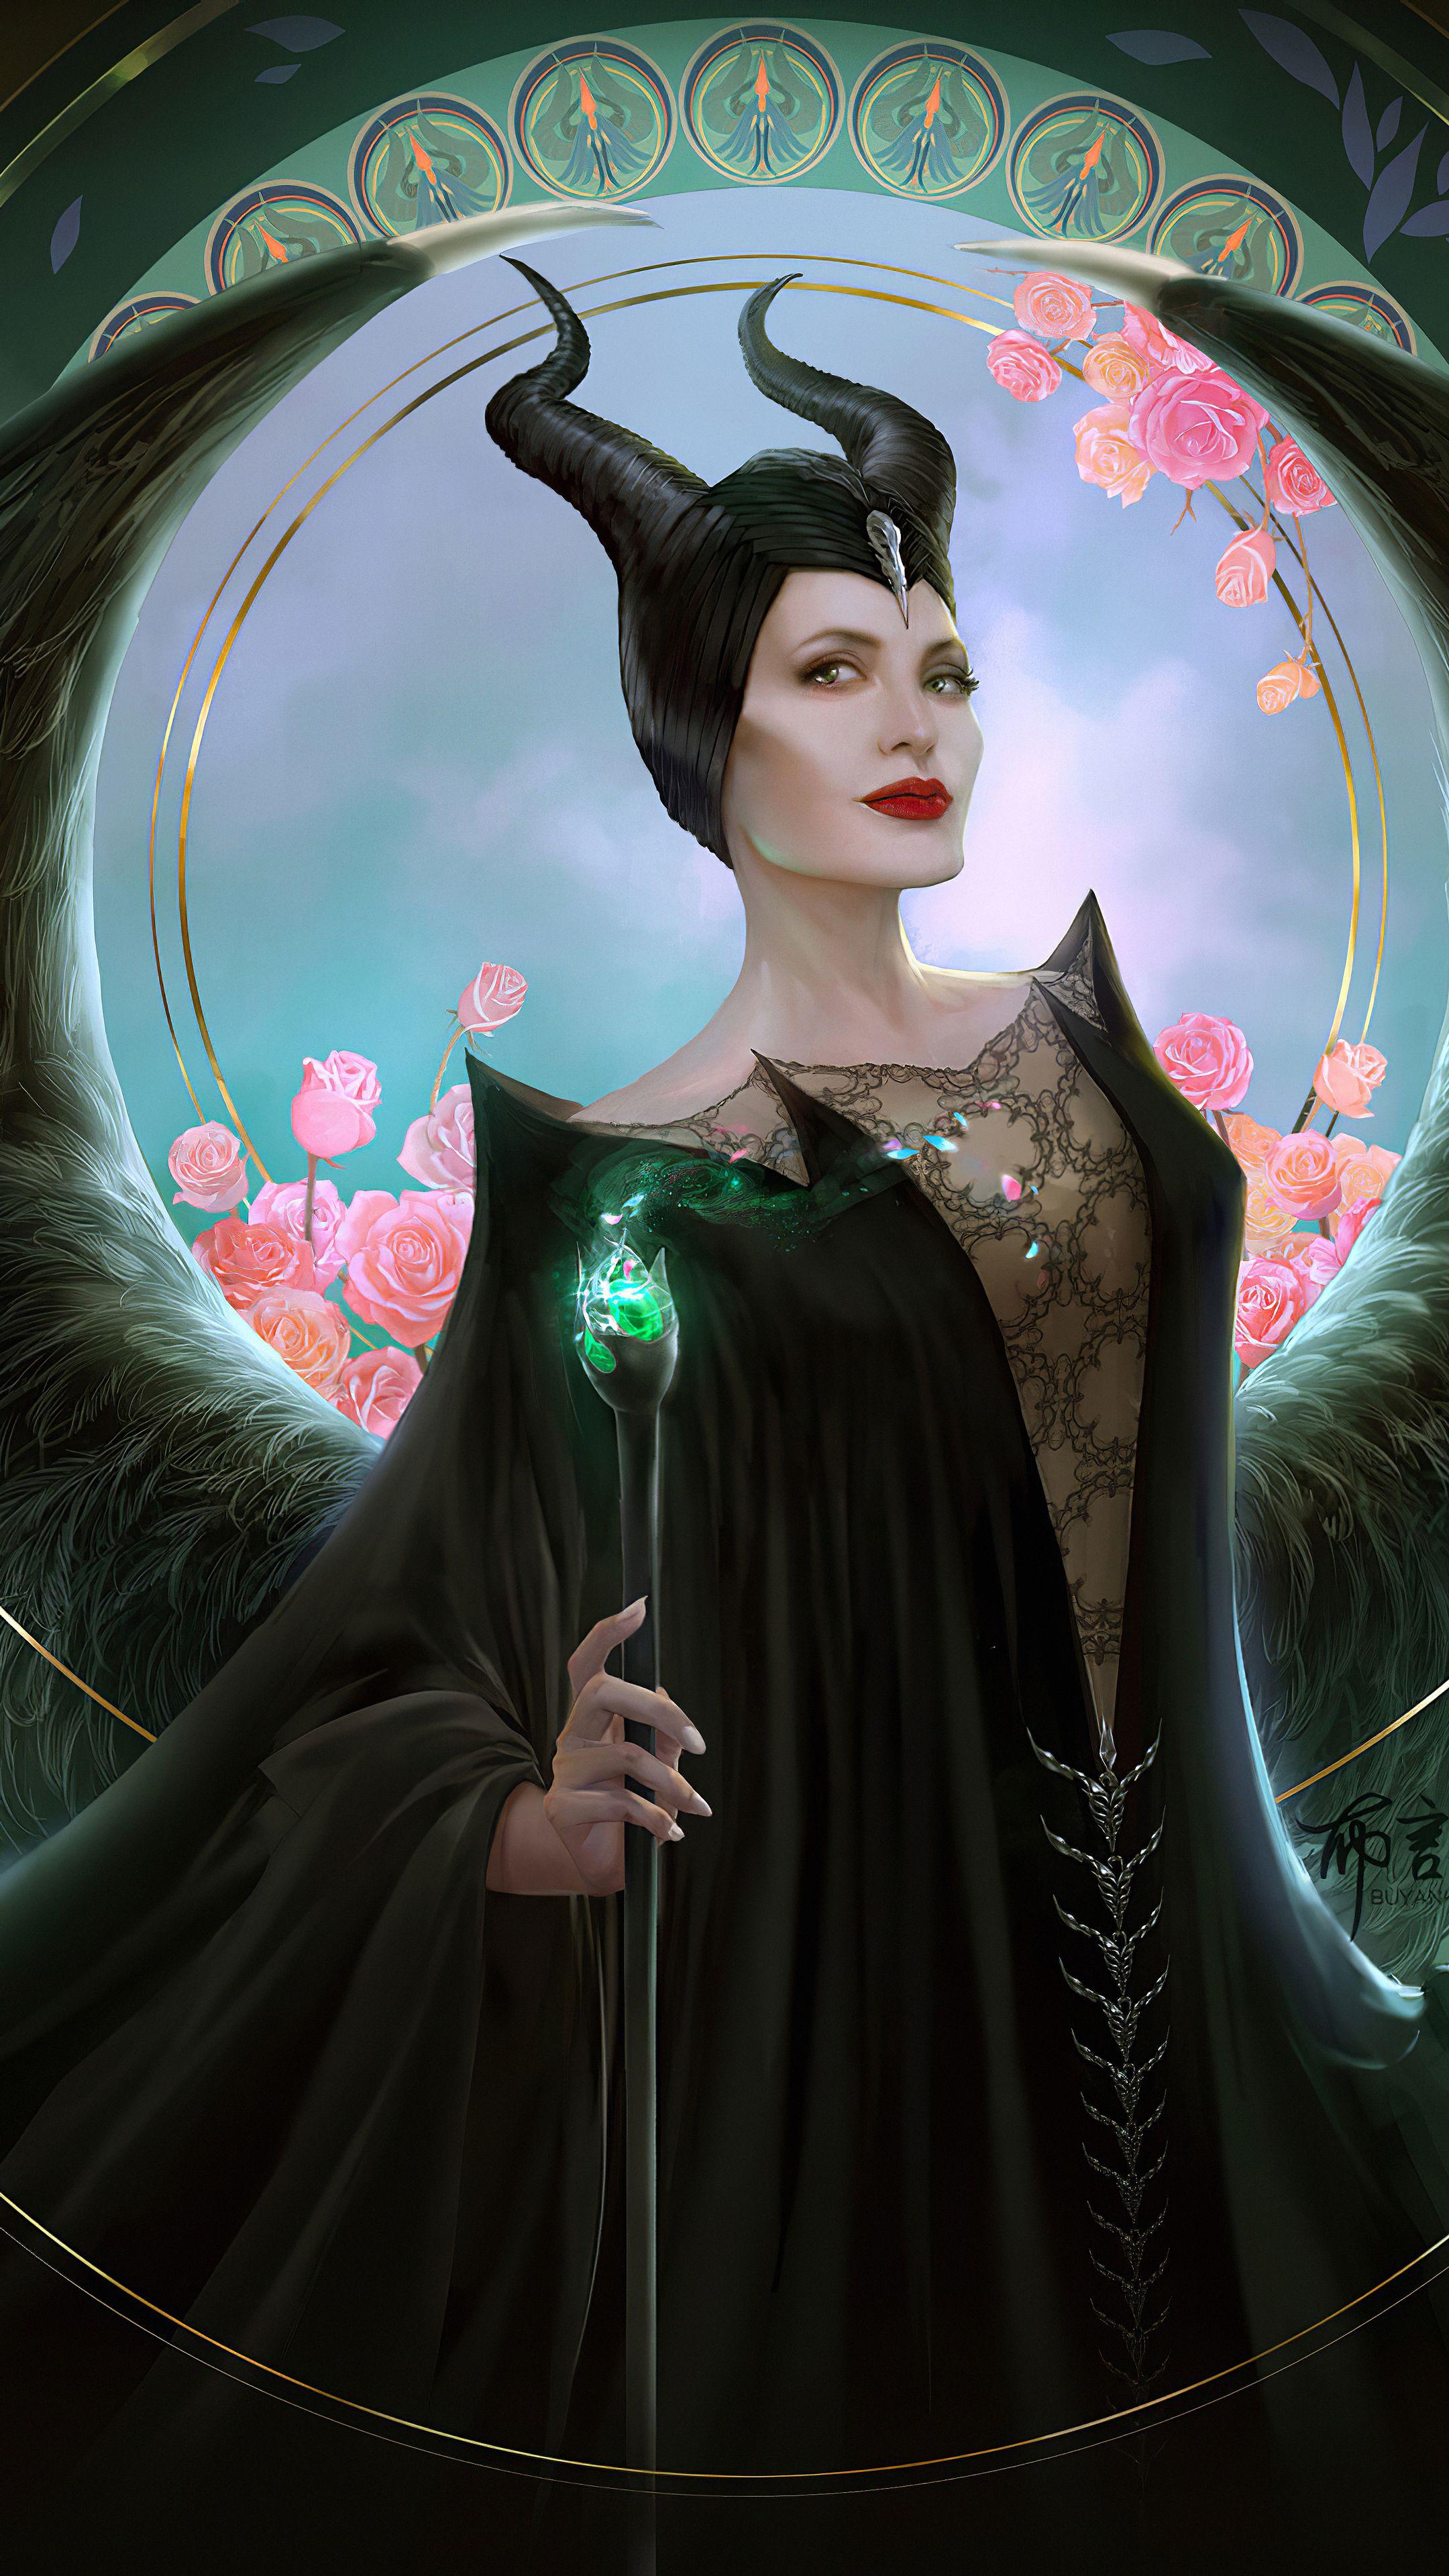 Maleficent 2 Movie Art In 2160x3840 Resolution Evil Disney Maleficent Disney Princess Tattoo